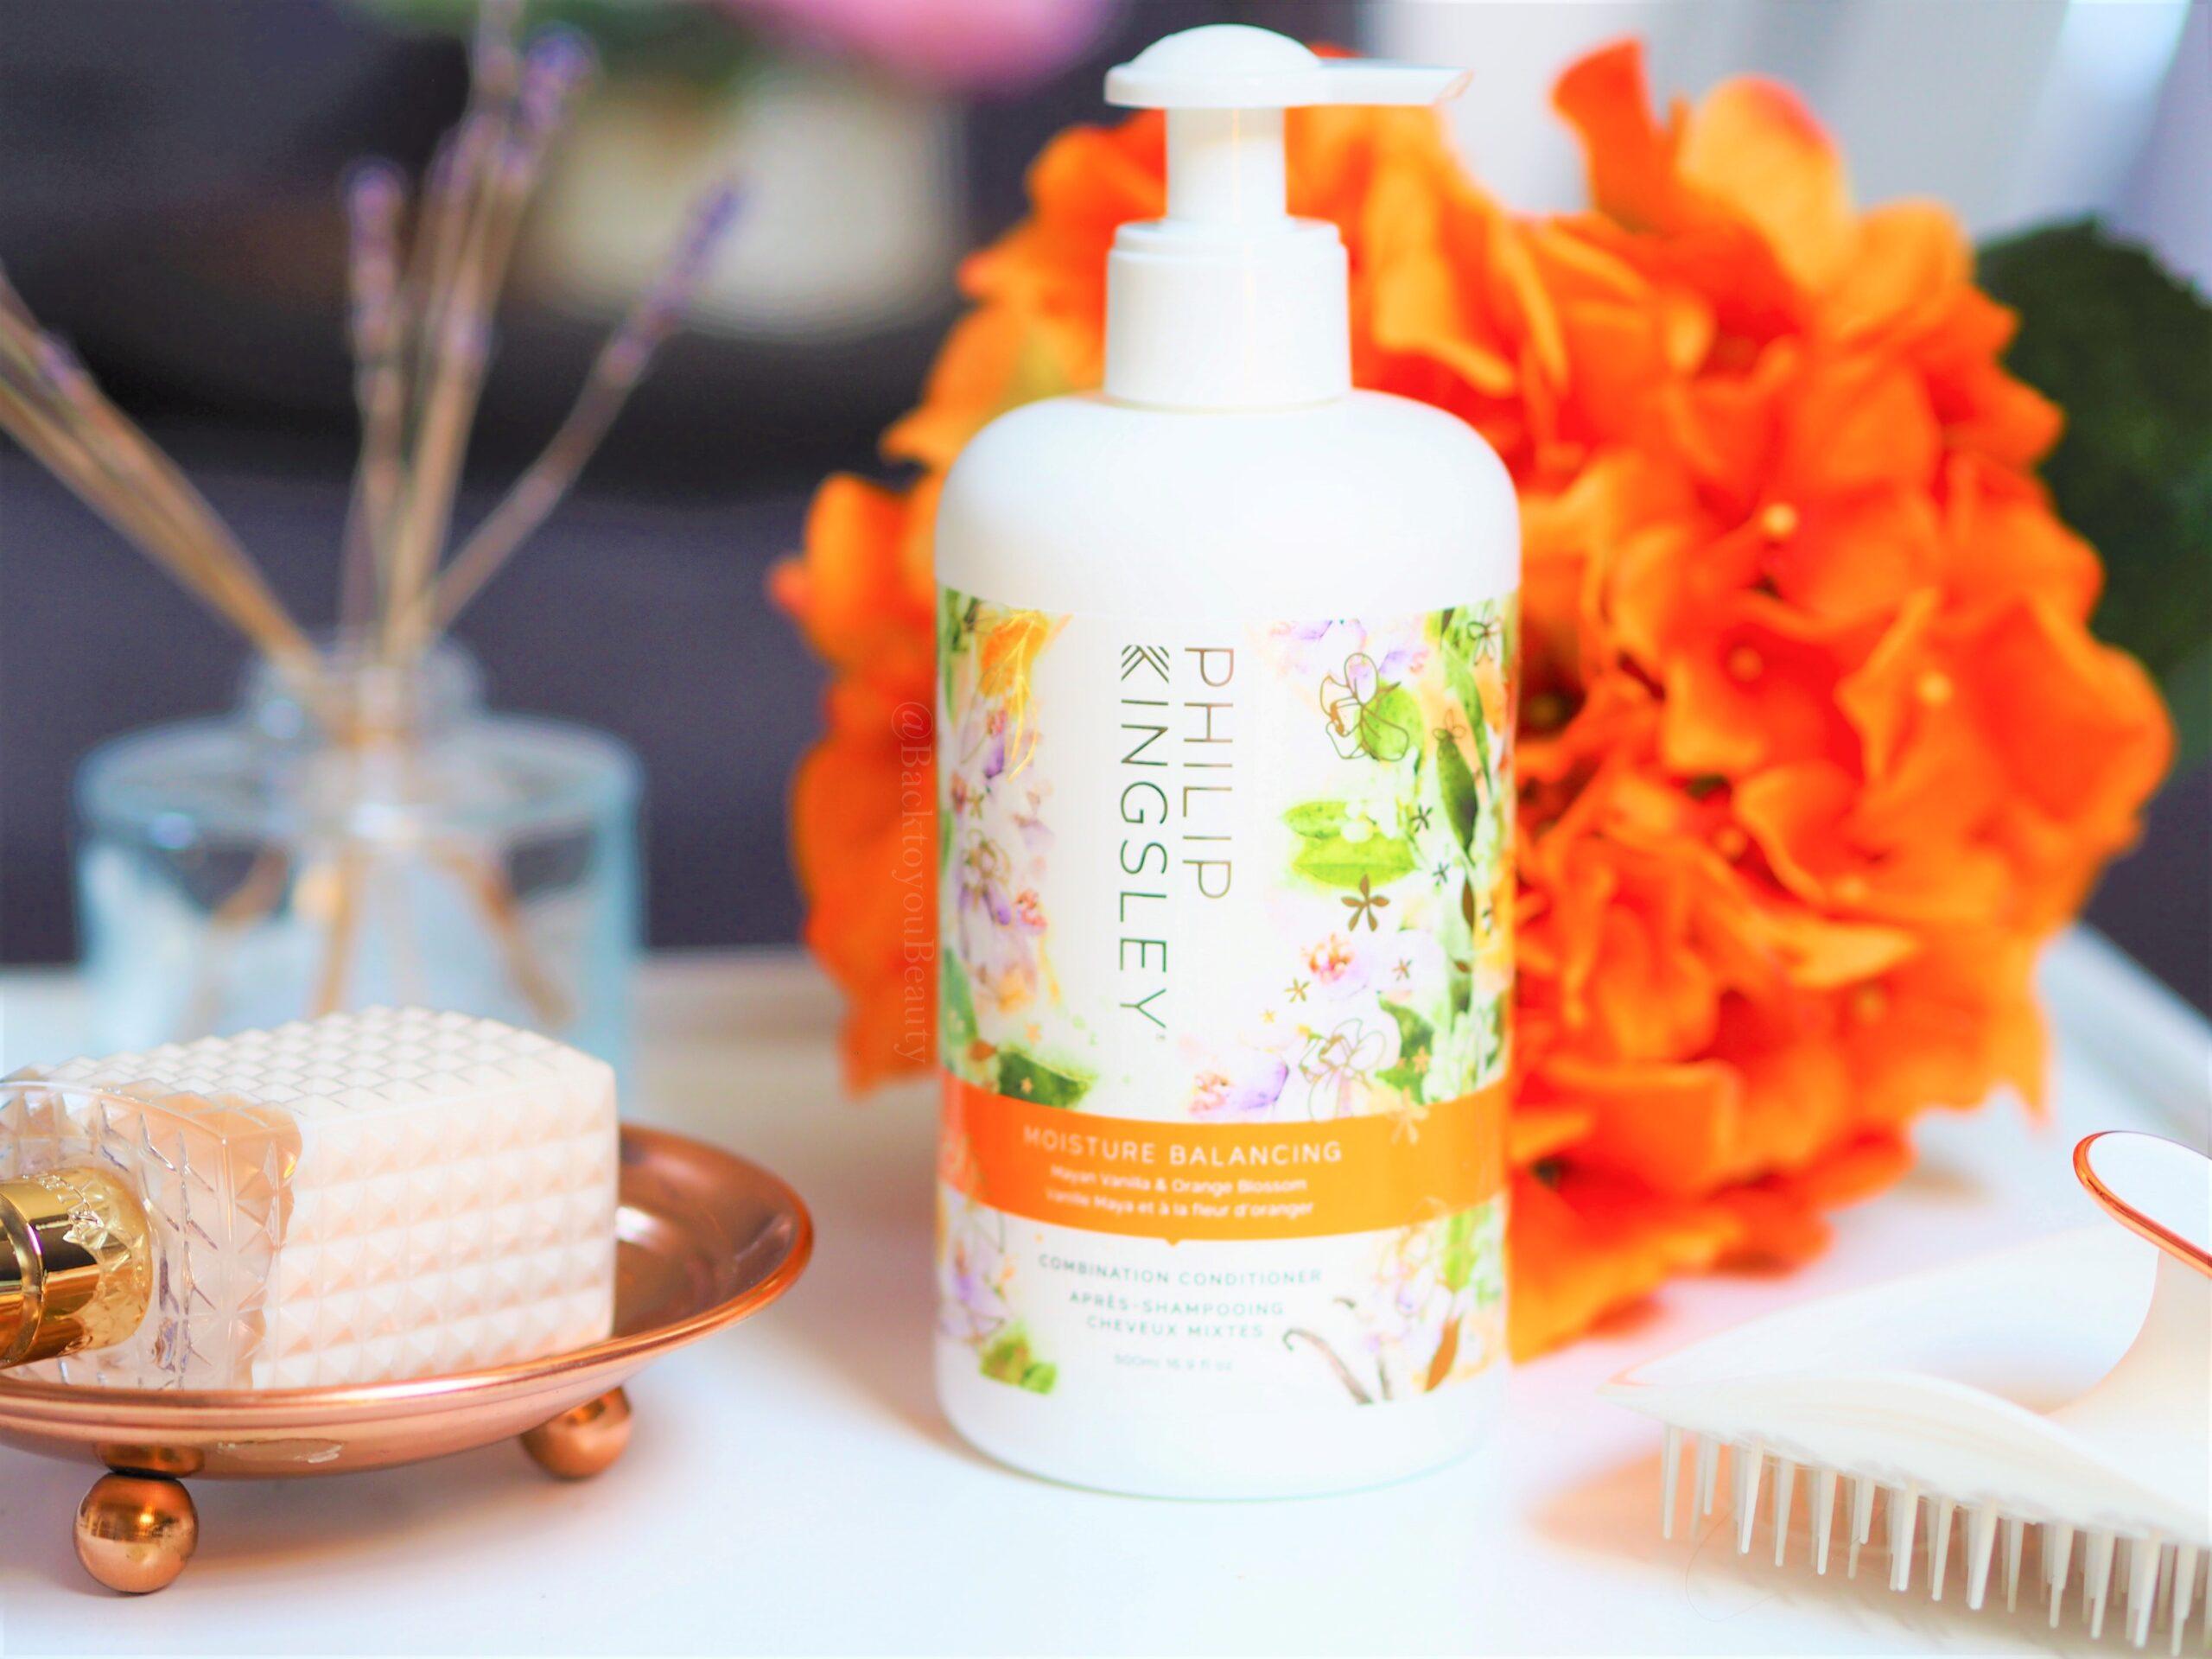 philip kingsley body building shampoo mayan vanilla and orange blossom